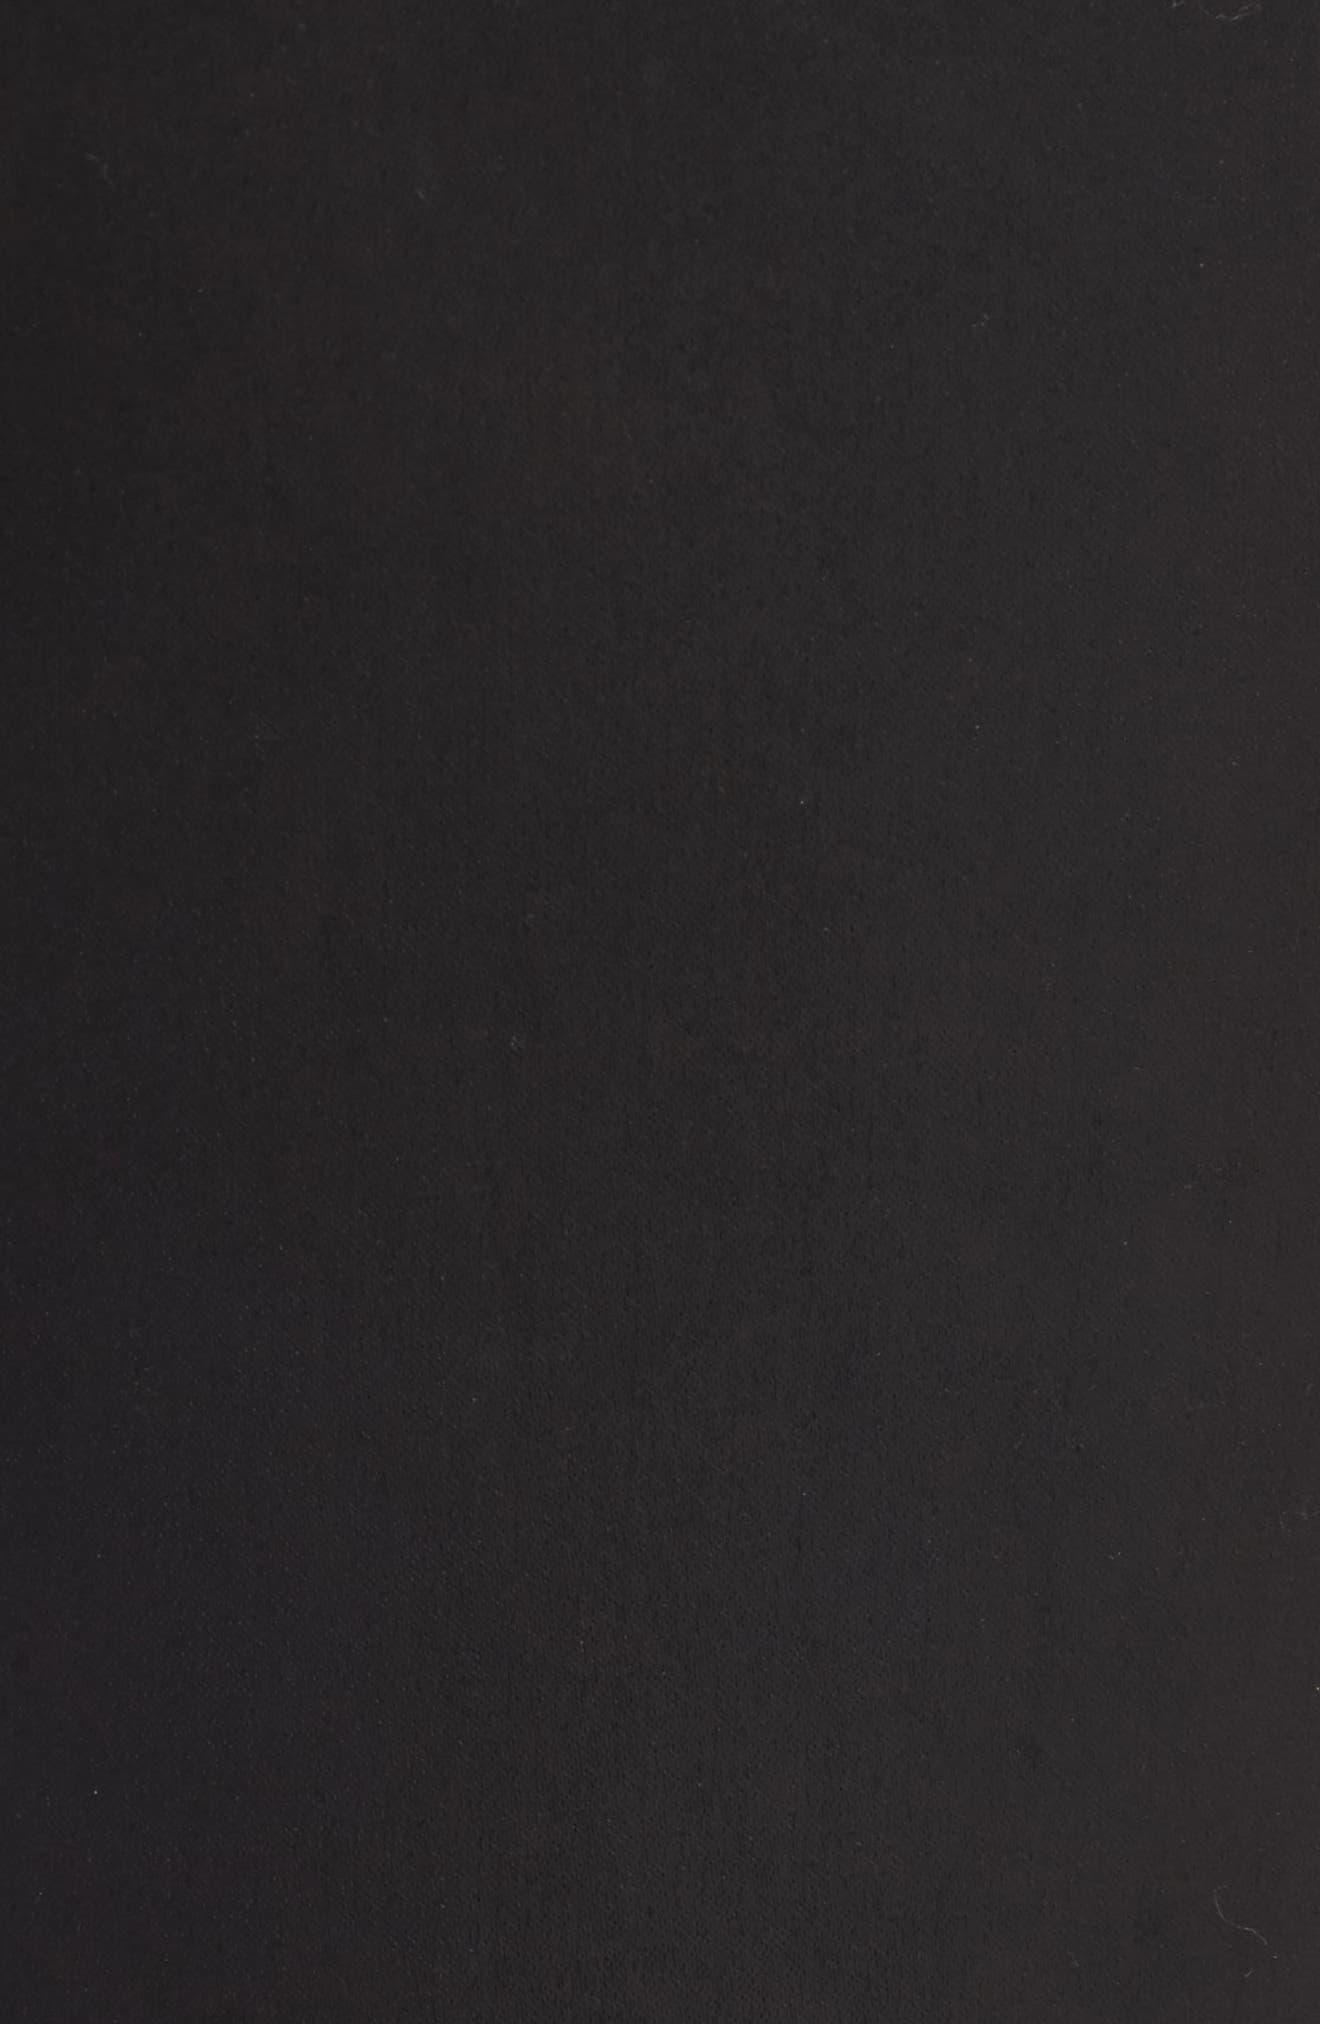 Farrah High Waist Ankle Skinny Jeans,                             Alternate thumbnail 5, color,                             Leatherette Super Black